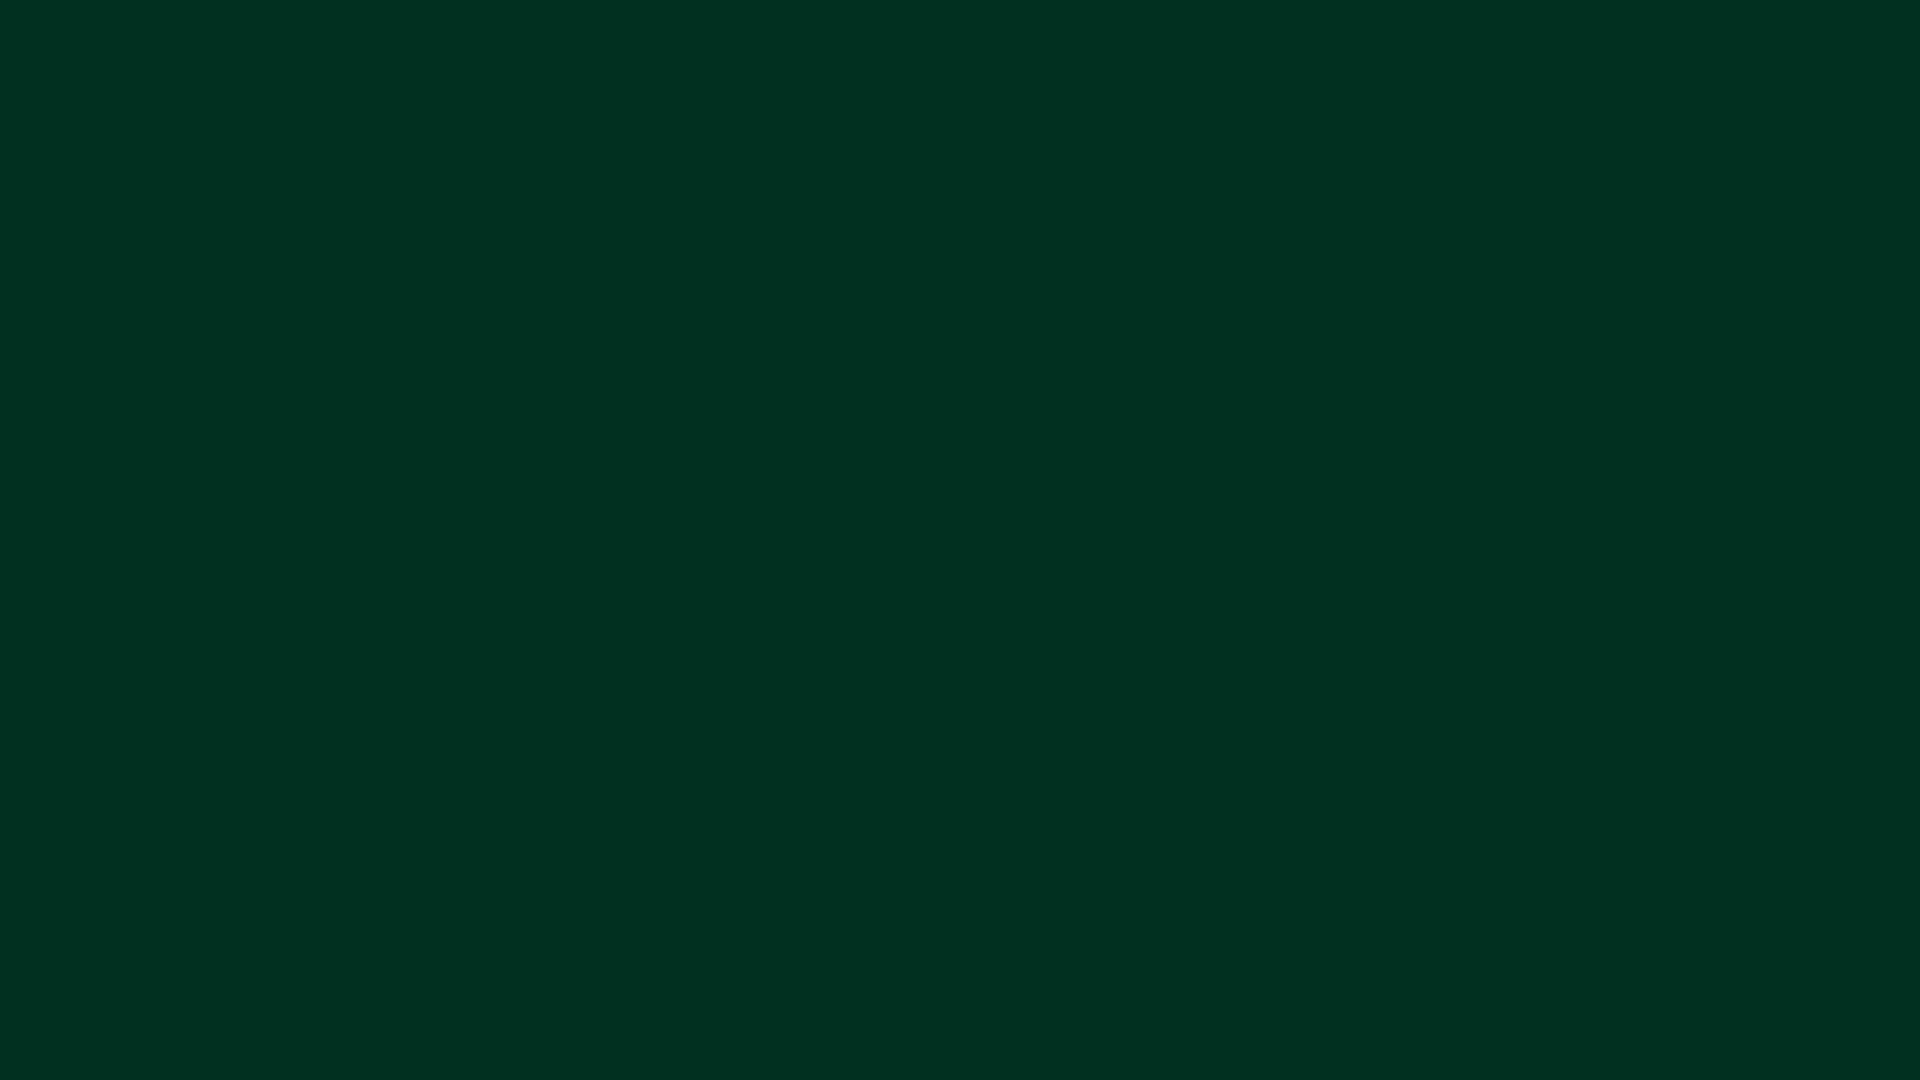 Dark Green Wallpaper Hd: 1920x1080 Dark Green Solid Color Background